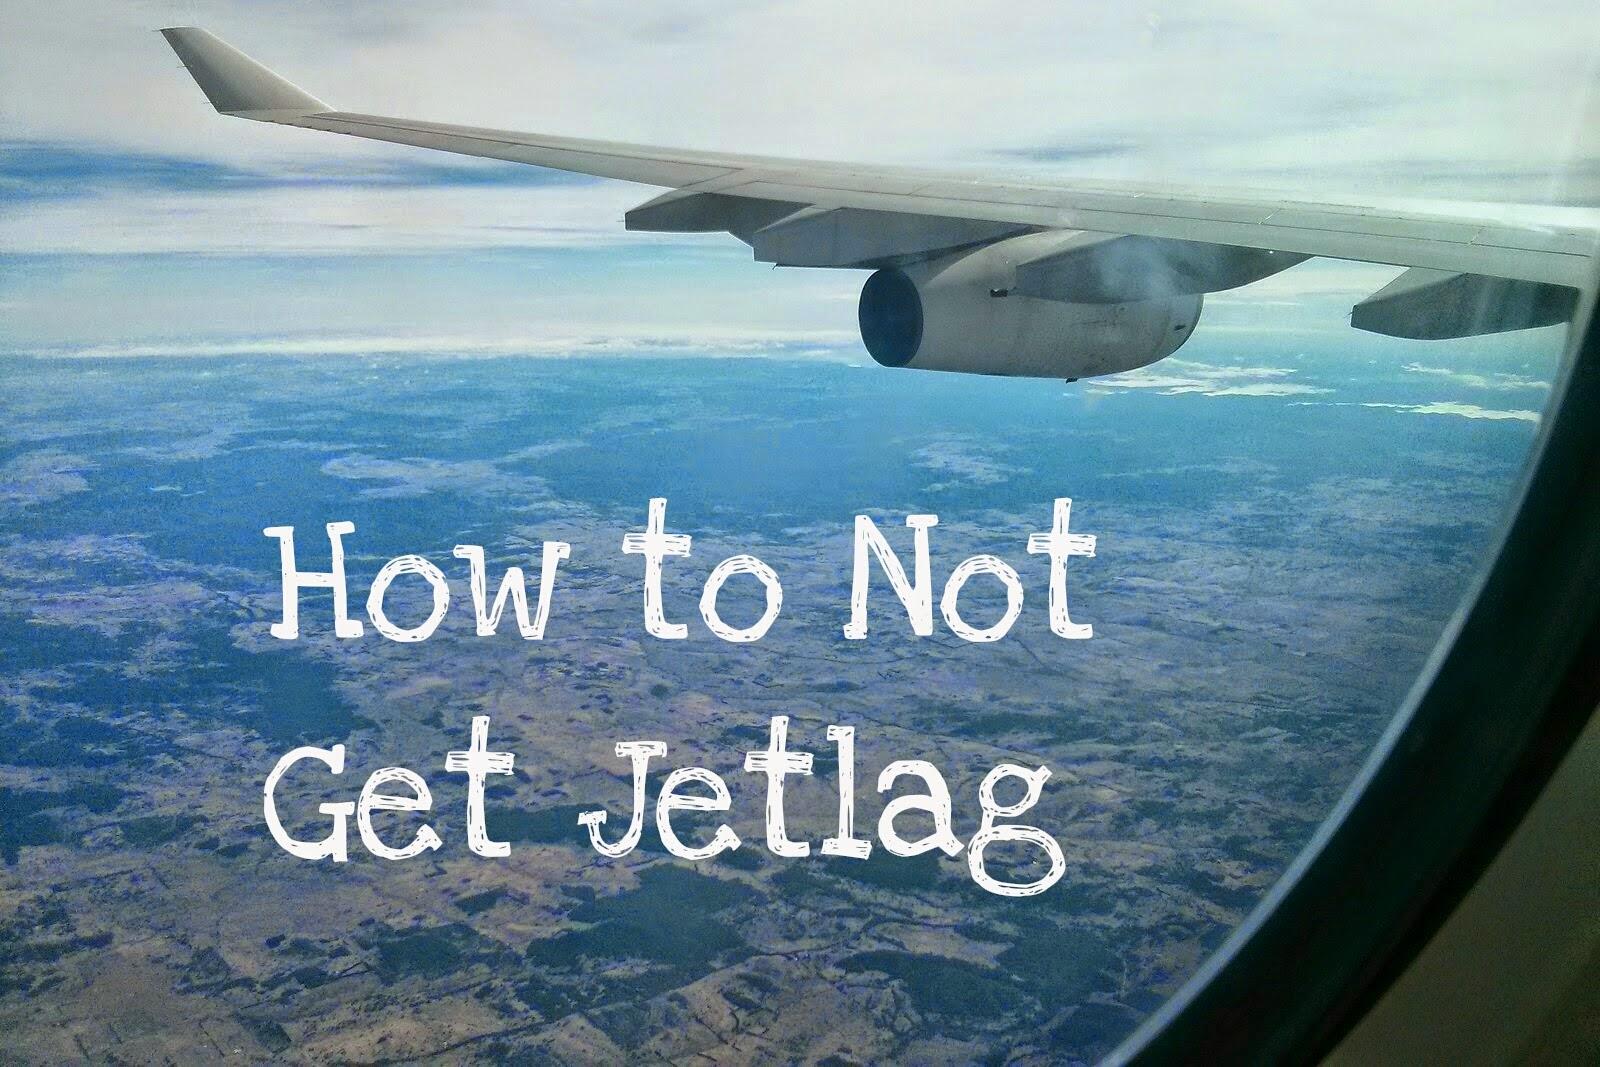 How to Not Get Jetlag